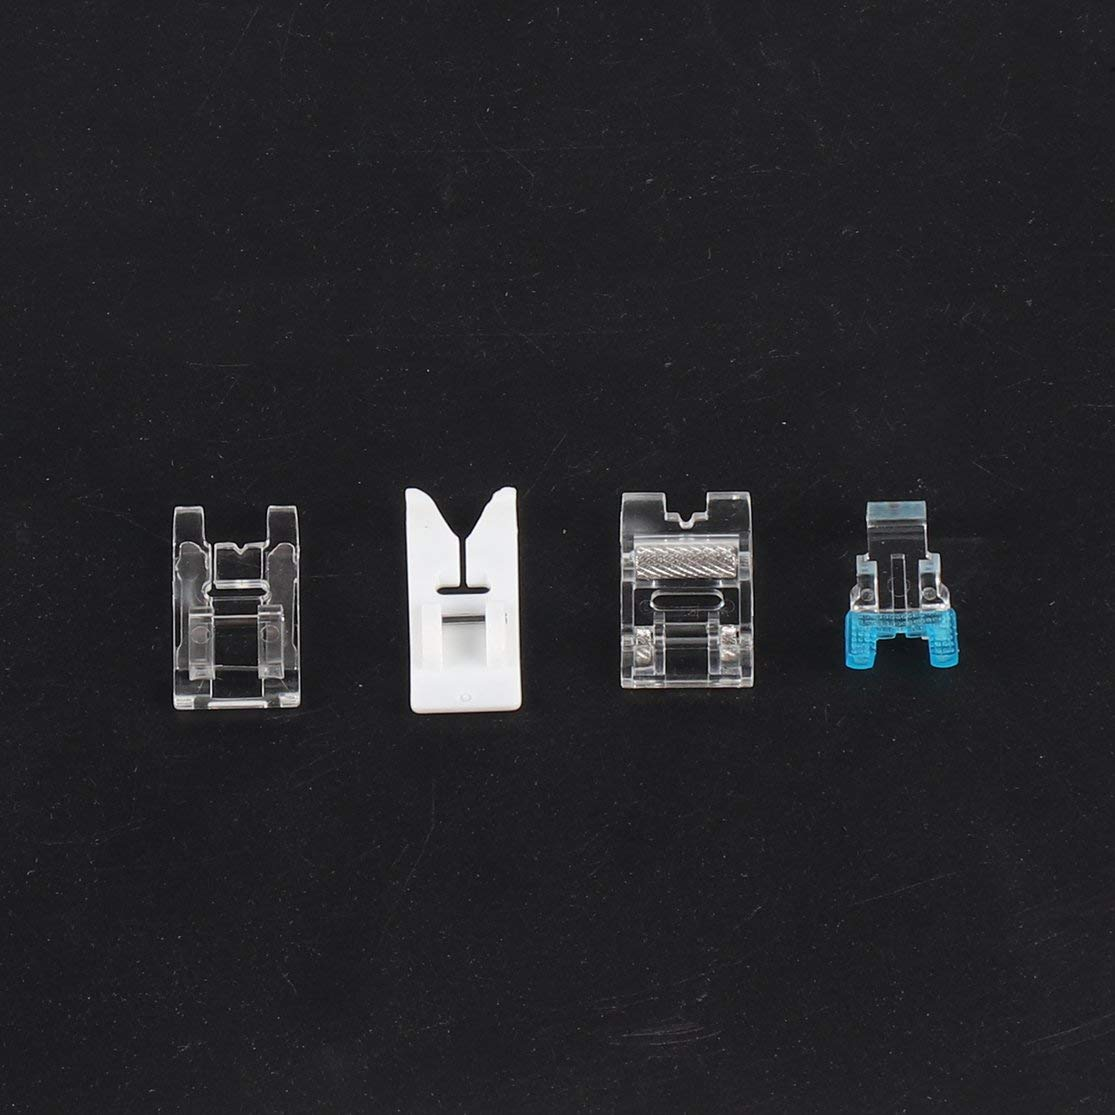 Satz Multifunktionale N/ähmaschine F/ü/ße N/ähfu/ß Ersatzteile Zubeh/ör Haushaltswerkzeuge Universal Pressfu/ß Set Candyboom 11 Teile